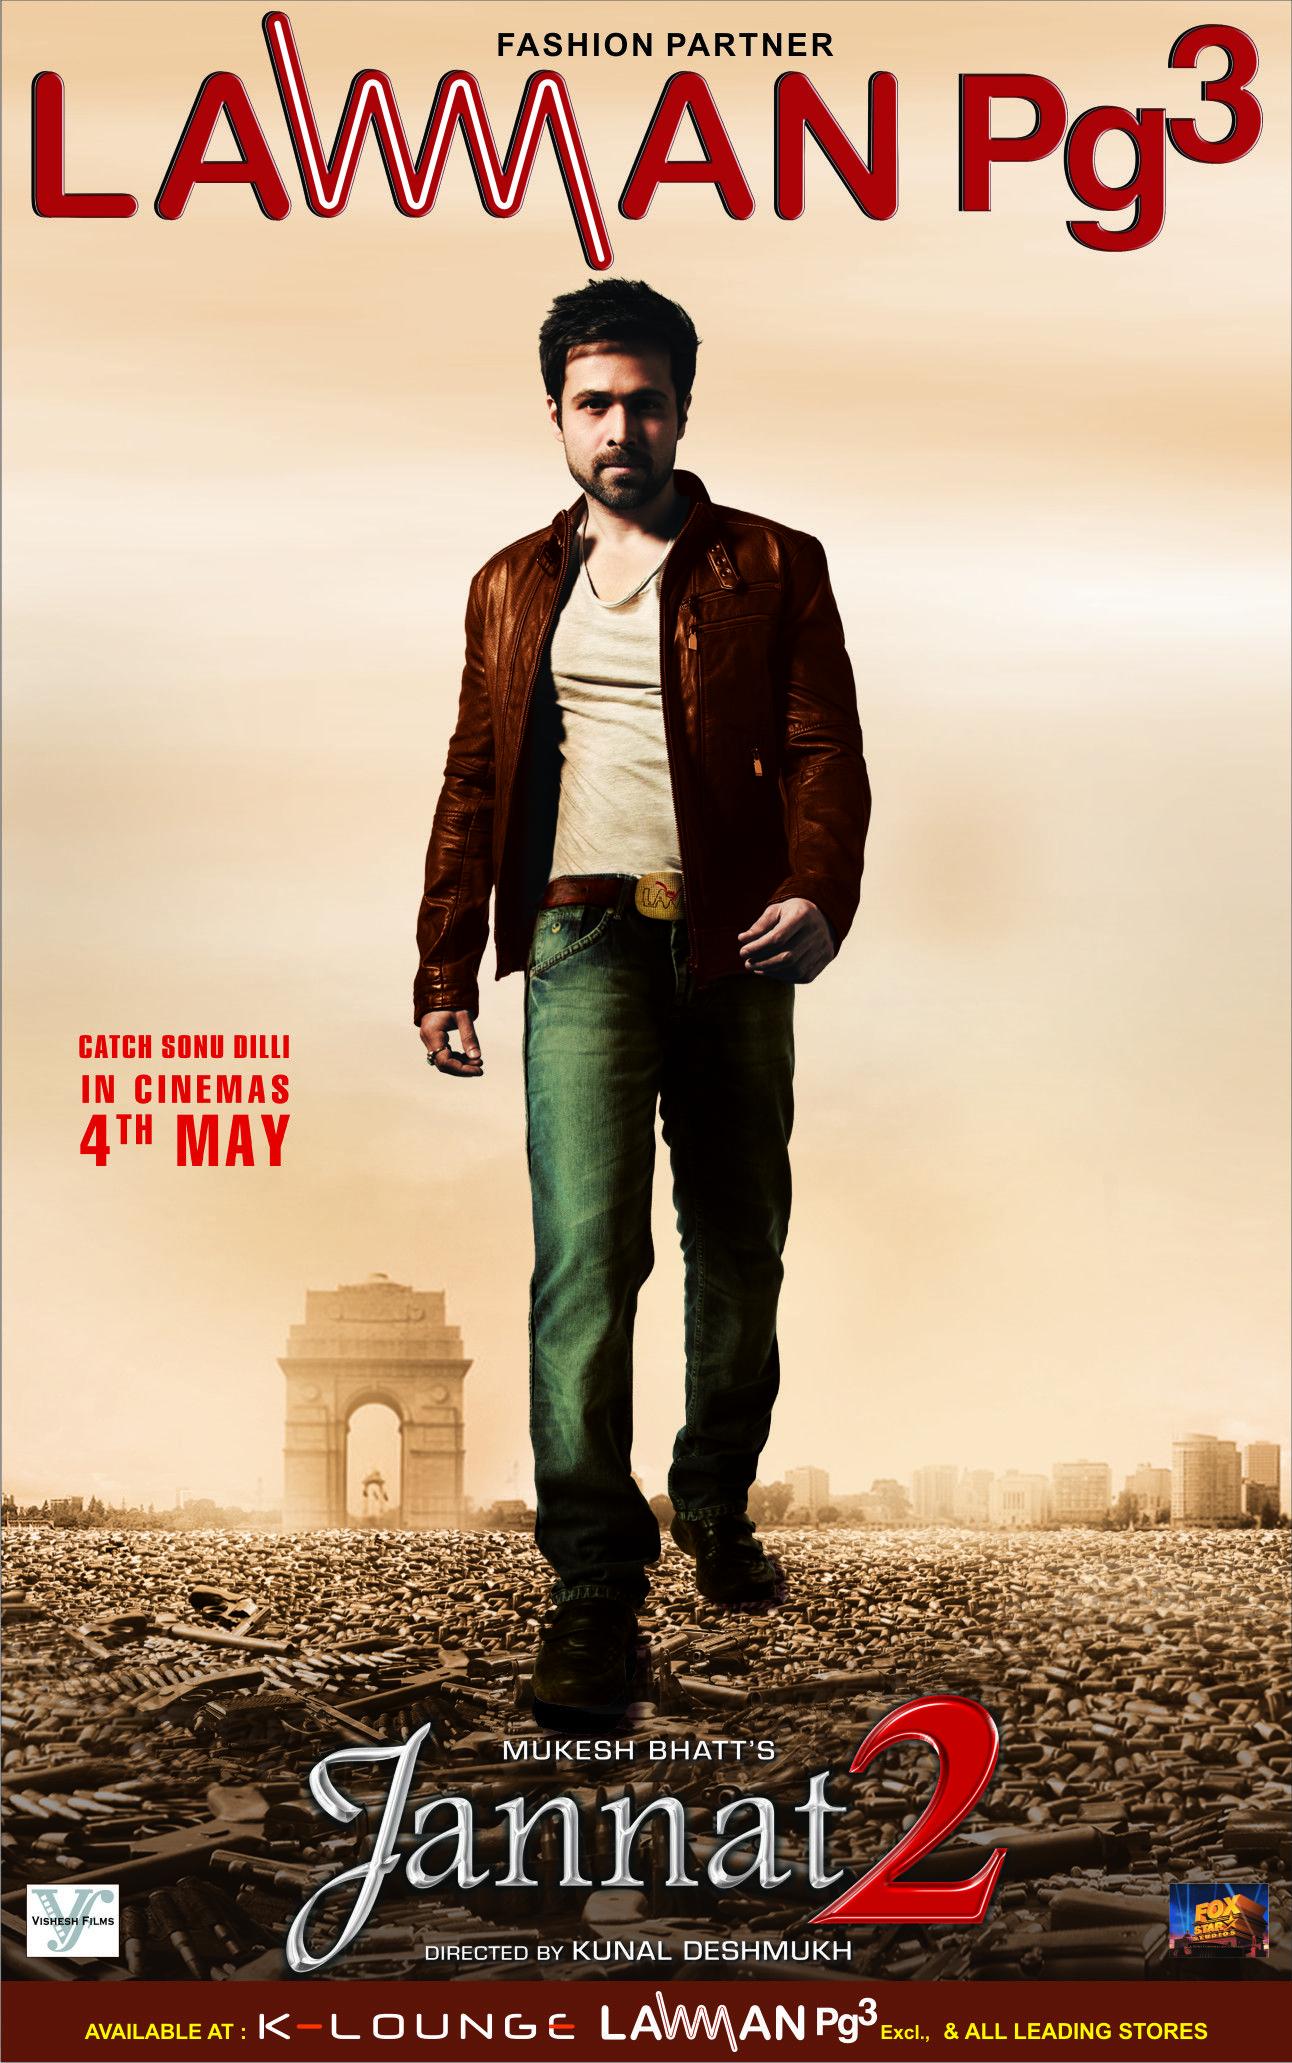 In Film Association With Hindi Movie Jannat 2 My Work Pinterest